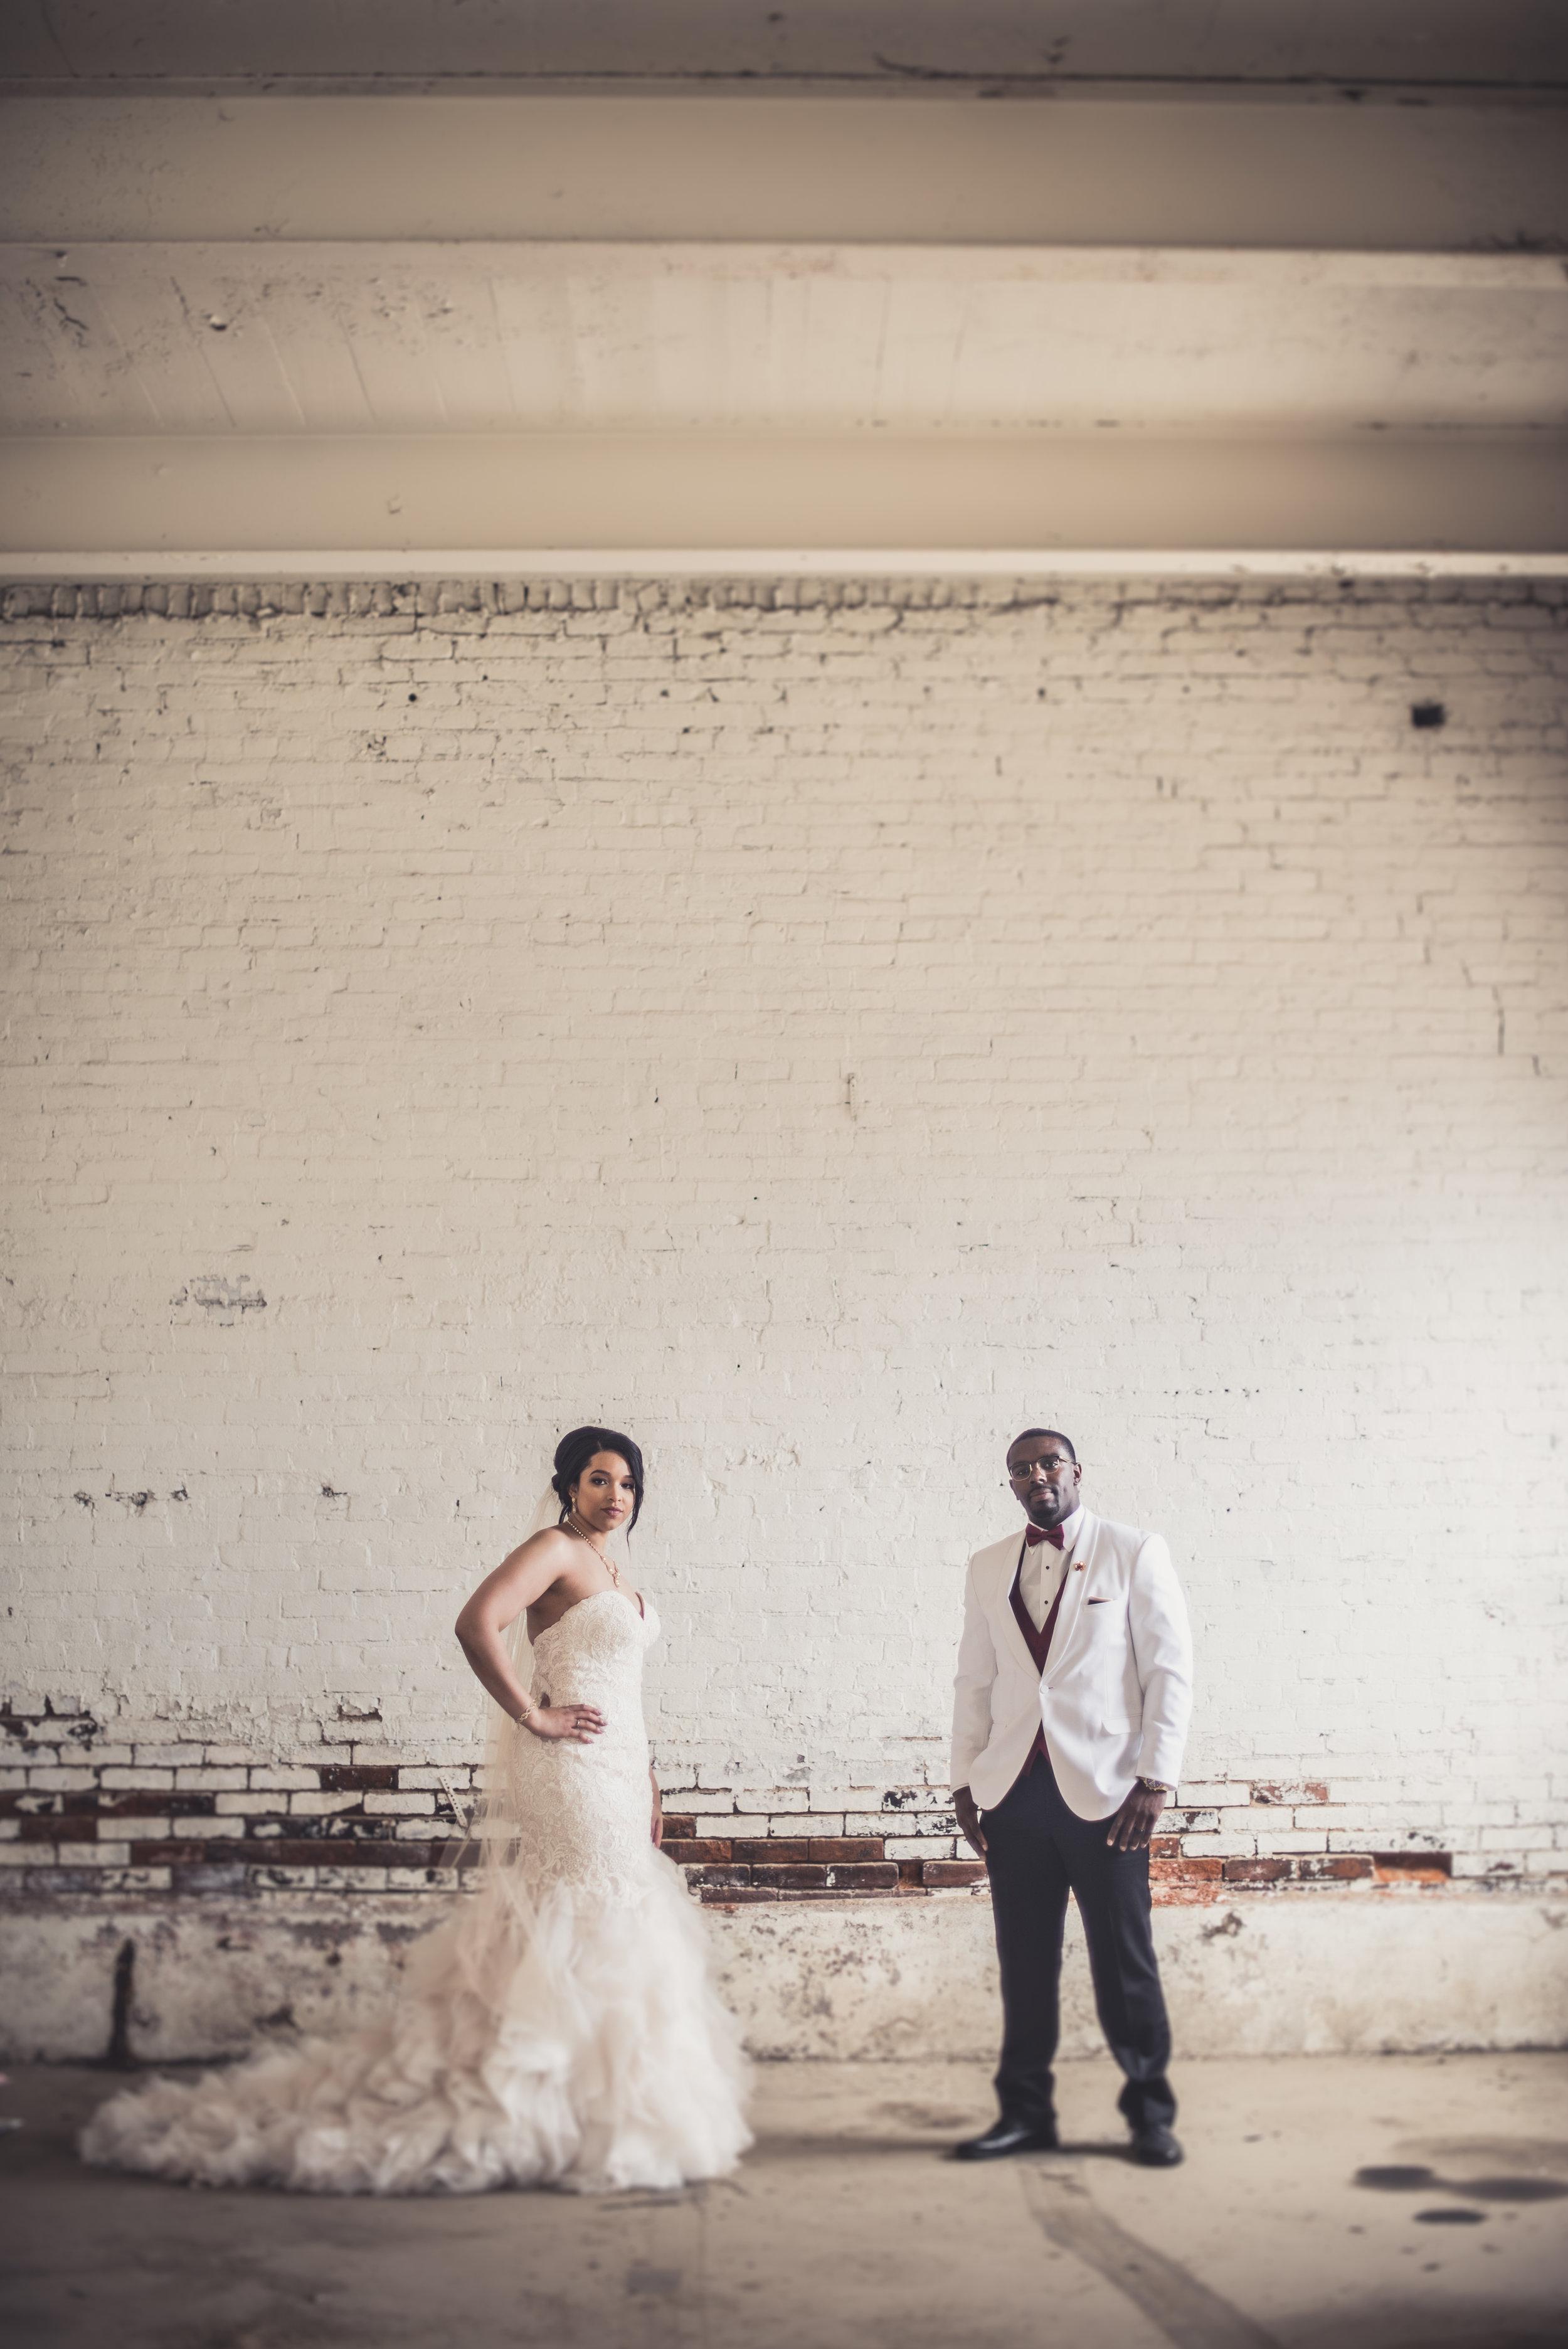 Burlington Iowa Wedding Midwest Photographer Melissa Cervantes _ Chantelle and Isaiah 320c.jpg